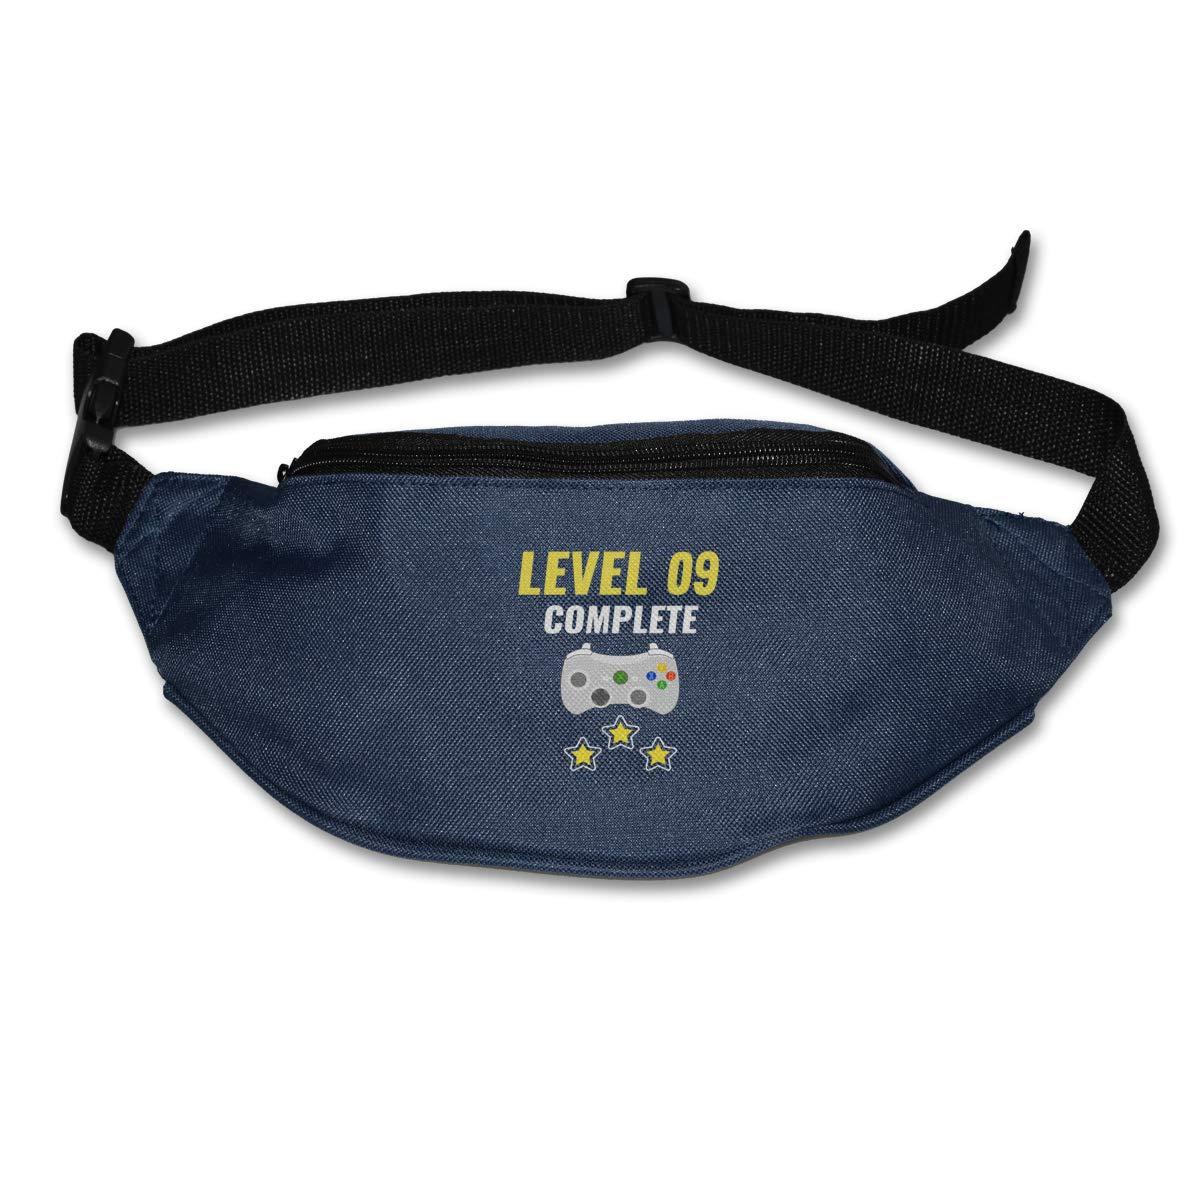 Level 09 Complete Sport Waist Packs Fanny Pack Adjustable For Travel